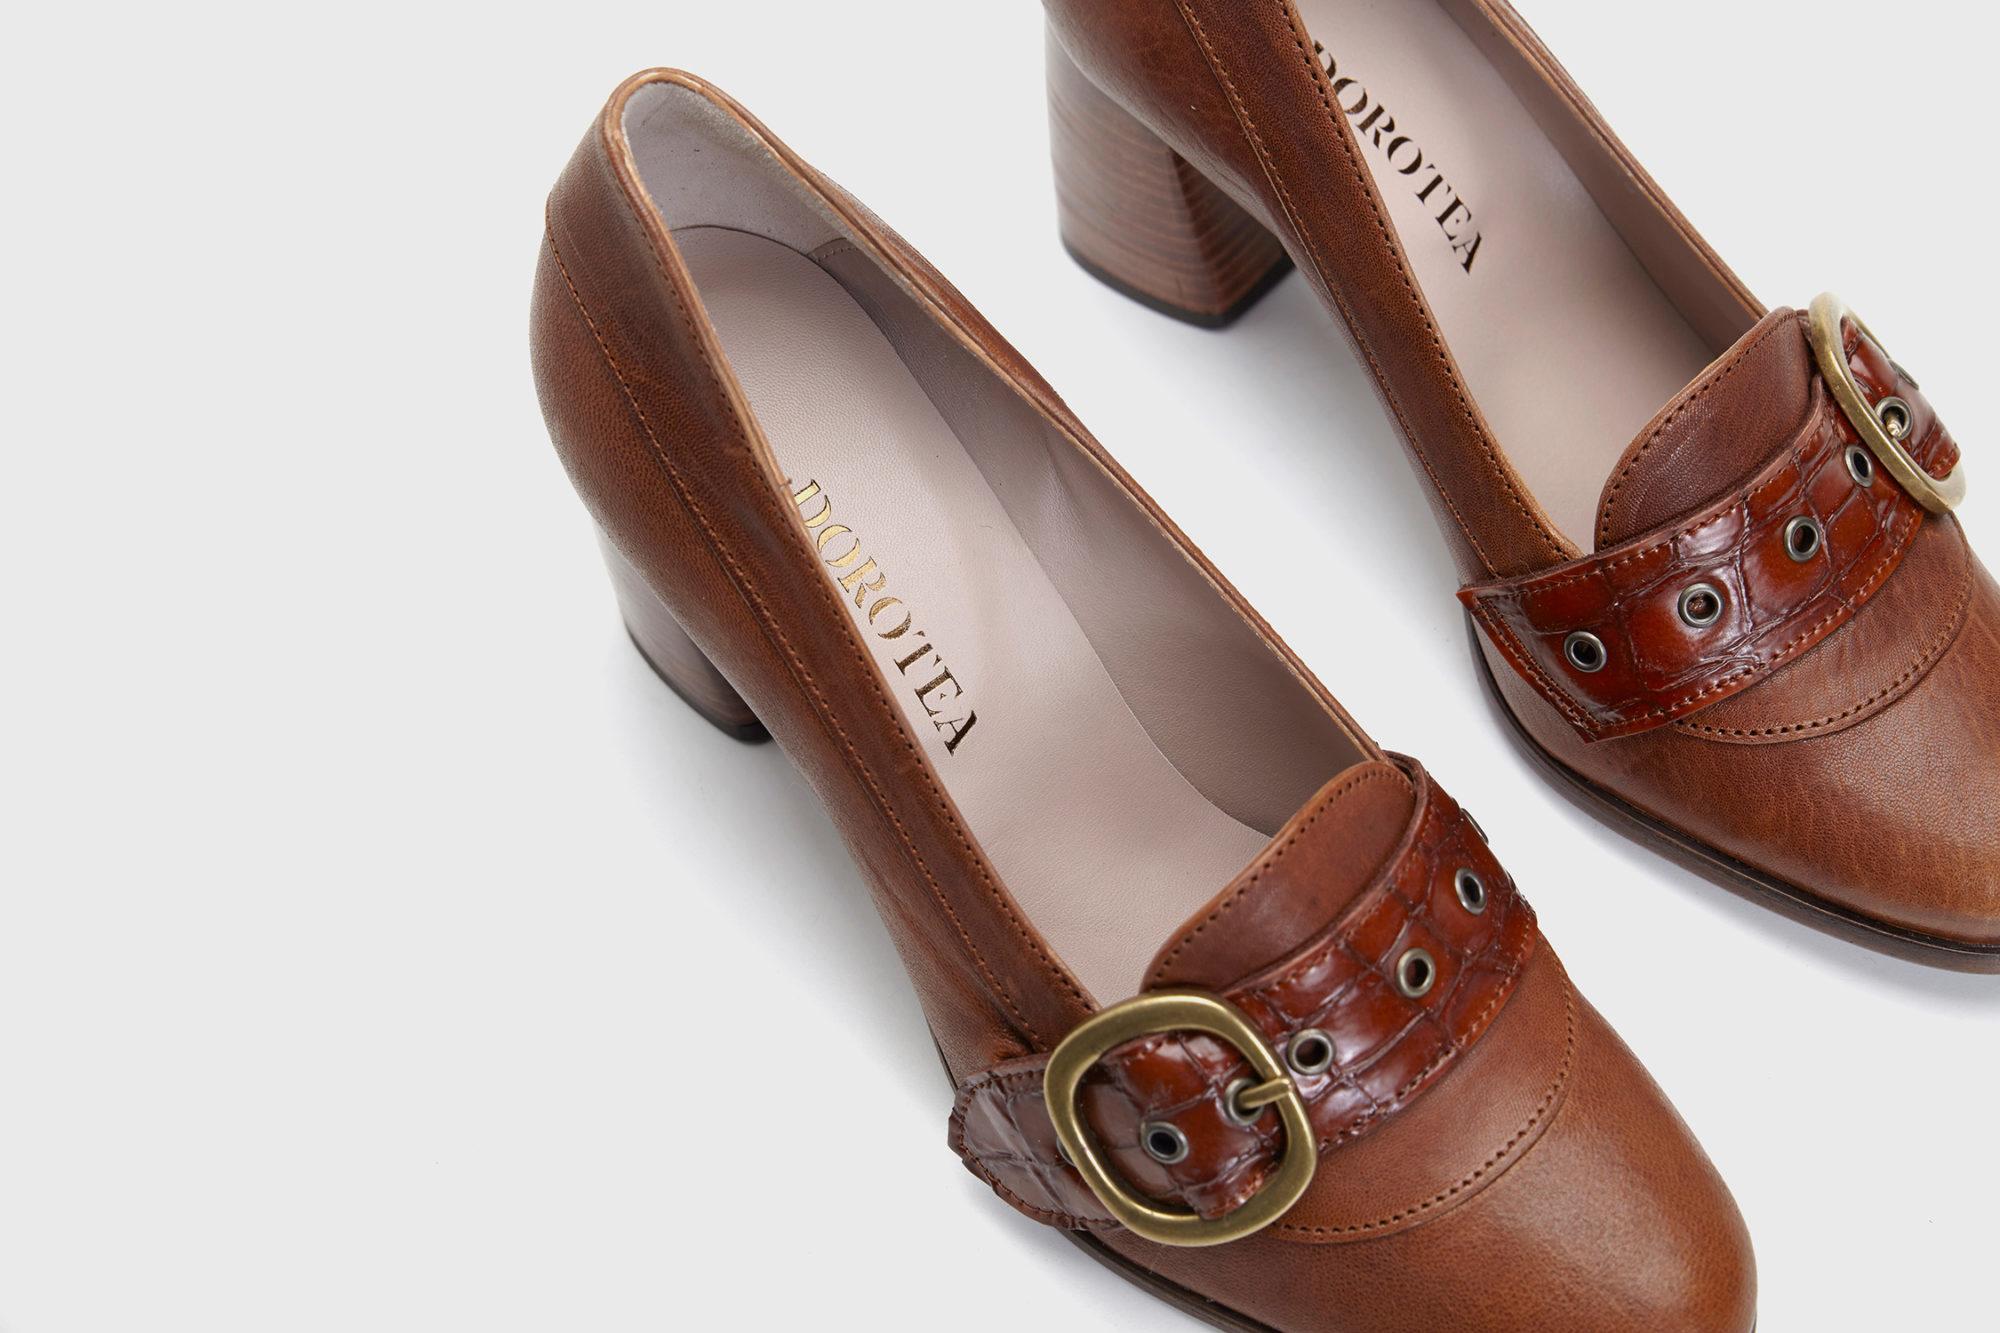 Dorotea zapato salón Juliette cuero fw18 detalle